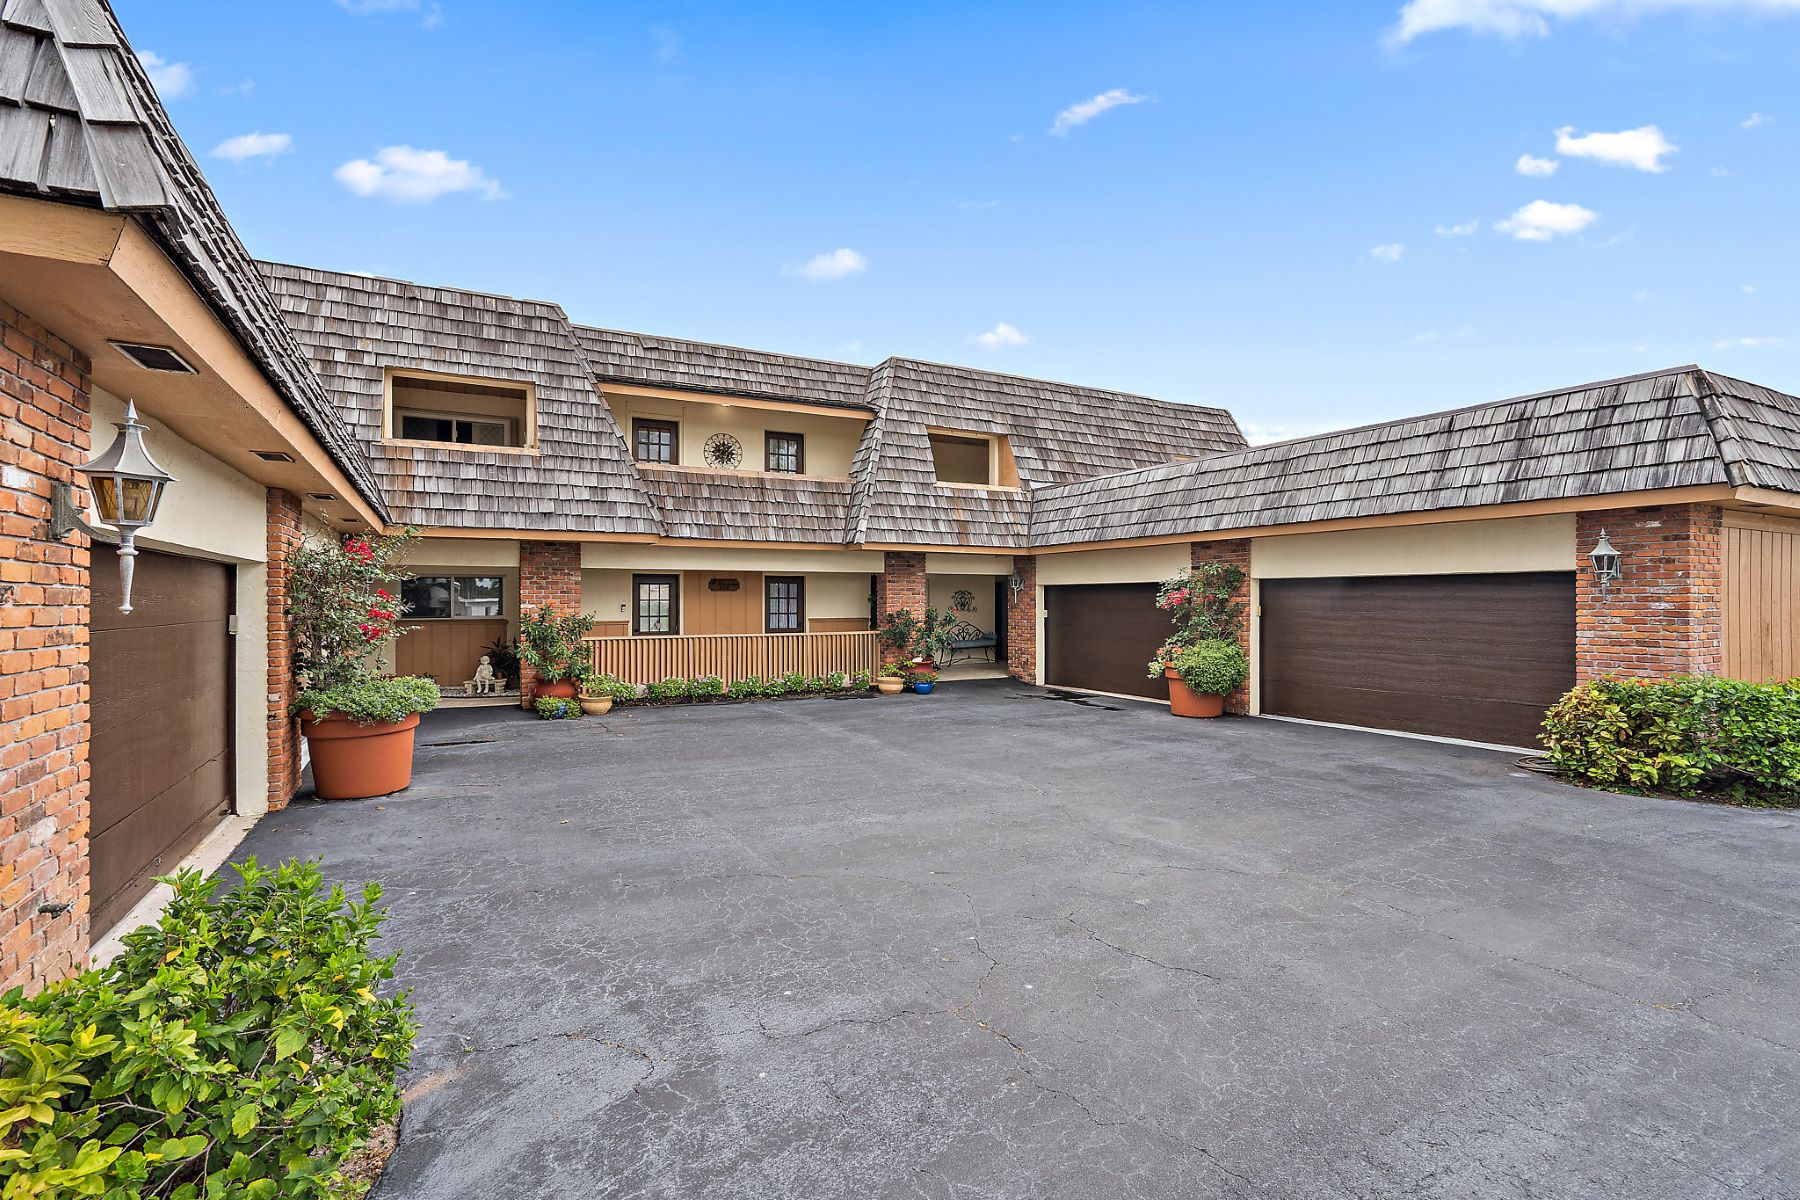 condominiums for Active at 316 Orange Tree Drive D Atlantis, Florida 33462 United States